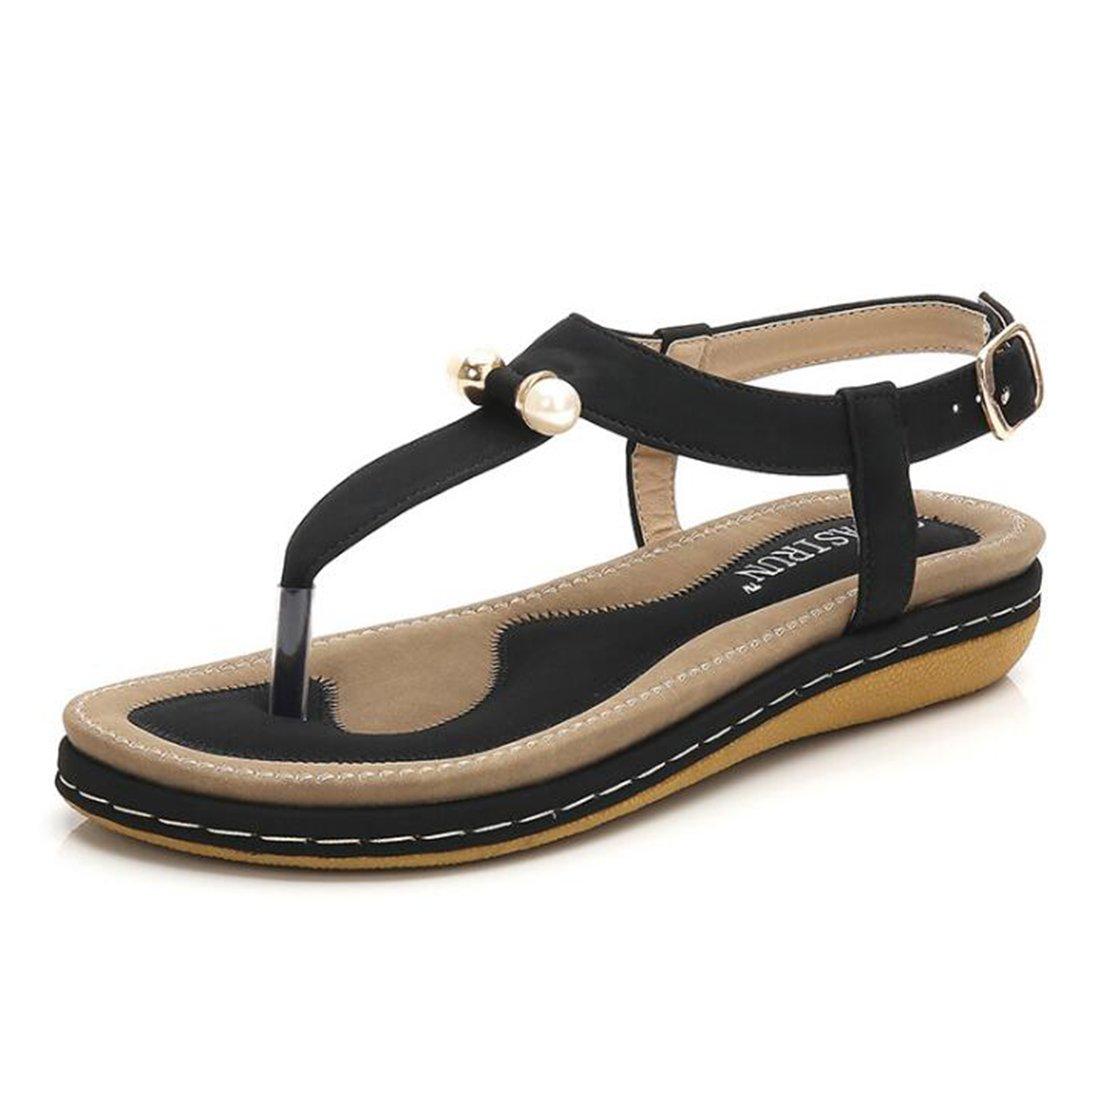 Frauen Sommer Sandalen Rouml;mersandalen Mode Muffin Plateau Sandalen  385 EU|Black